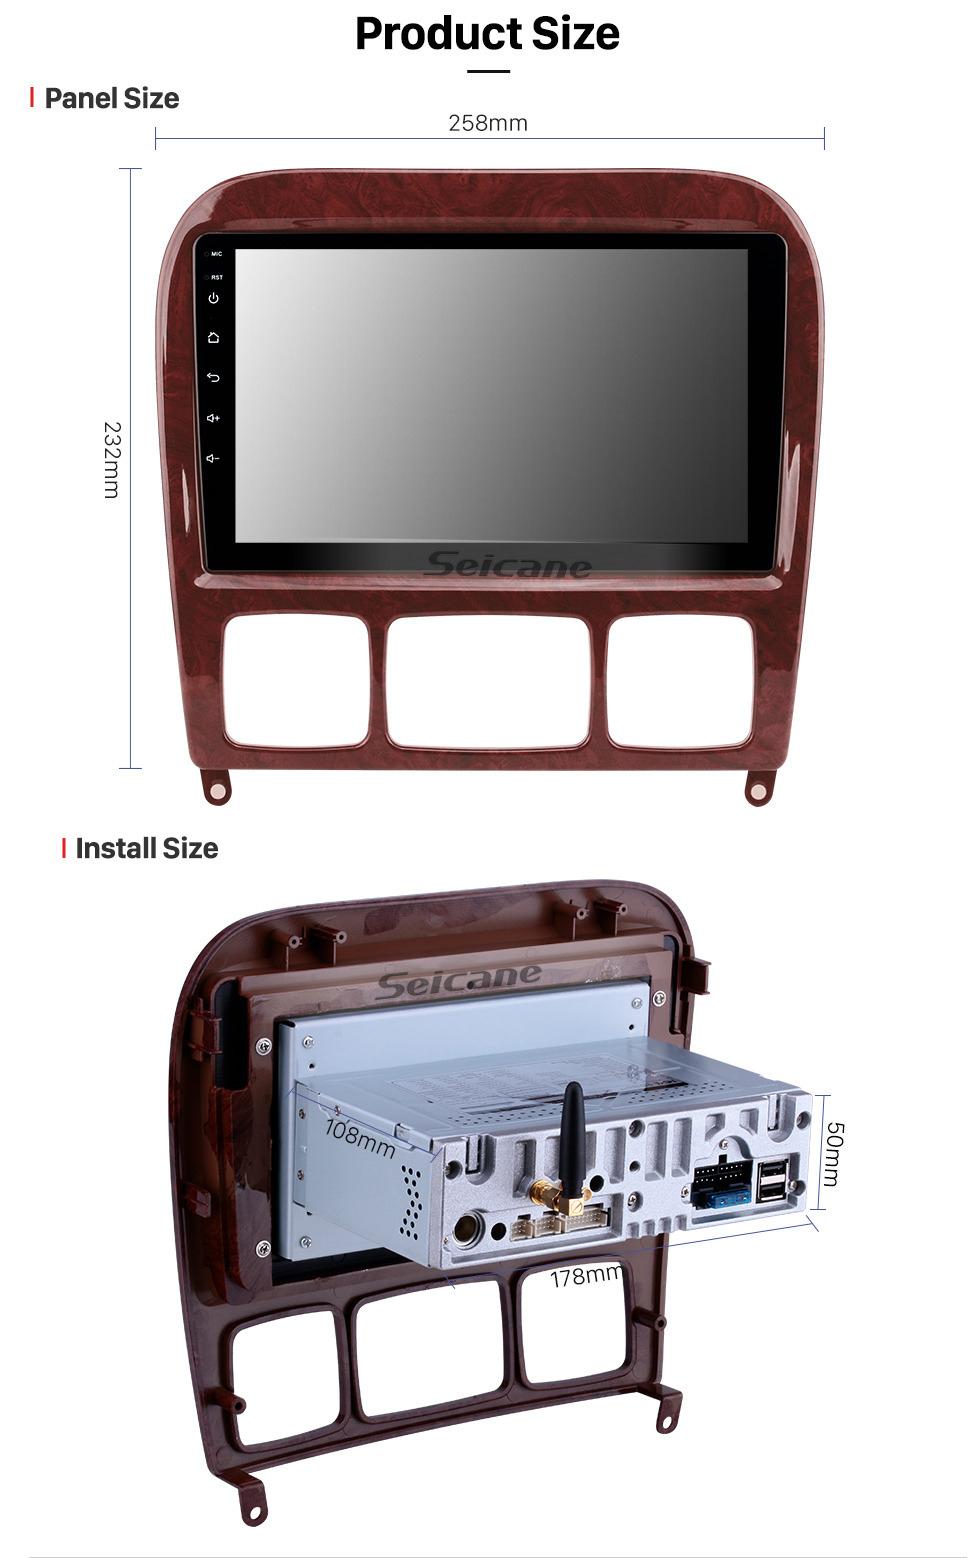 Seicane Android 9.0 Radio HD con pantalla táctil Navegación GPS para 1998-2005 Mercedes-Benz CL-Class W215 (CL600, CL550, CL55 AMG) con Bluetooth Música Audio Aux USB WIFI Control del volante Enlace espejo 1080P